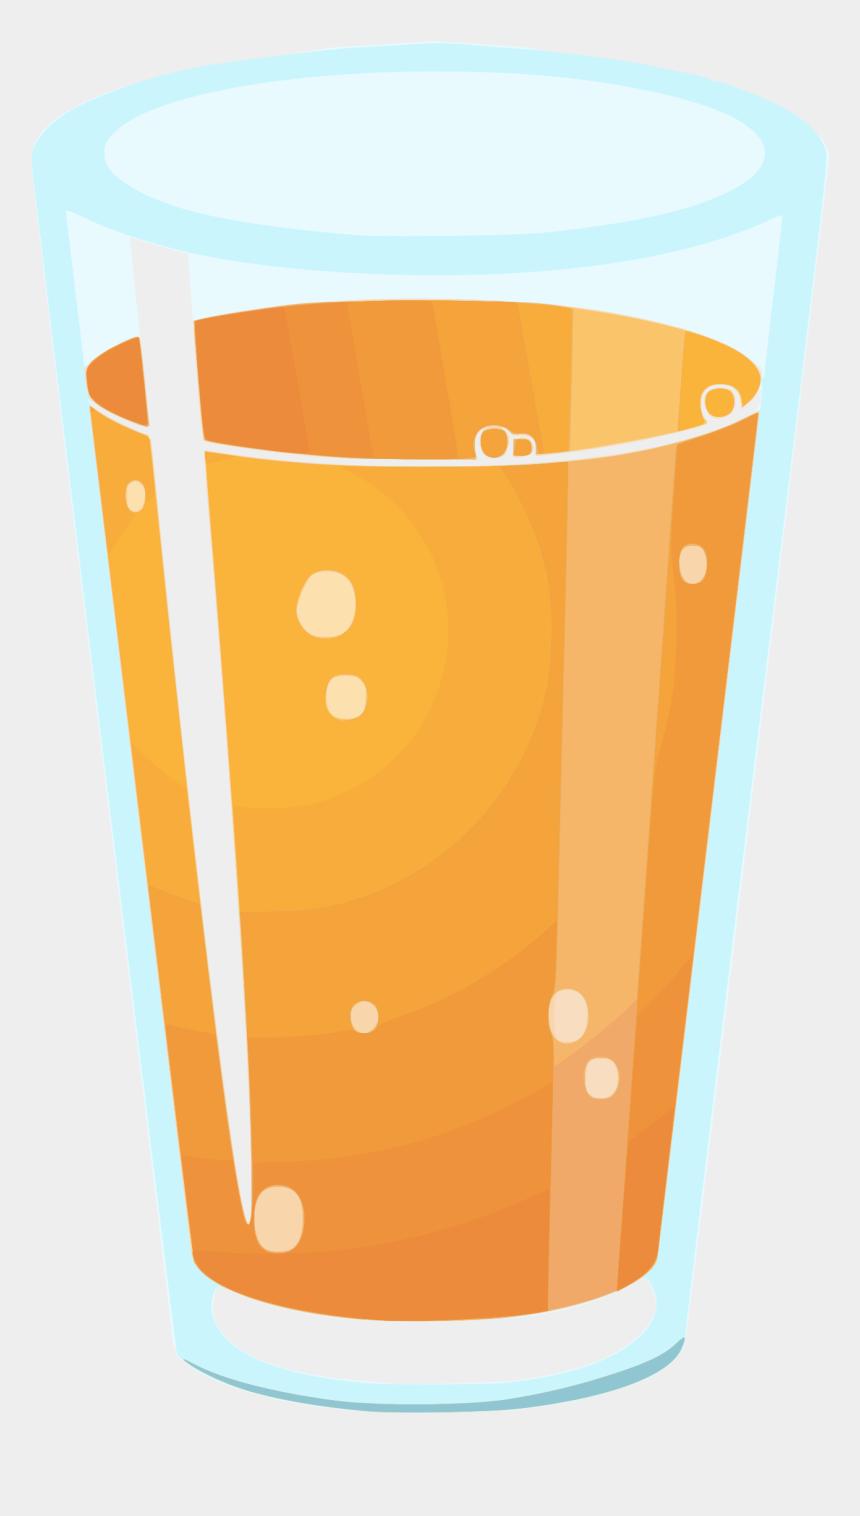 fingerprint clipart, Cartoons - Orange Squash Clipart - Glass Of Orange Juice Clipart